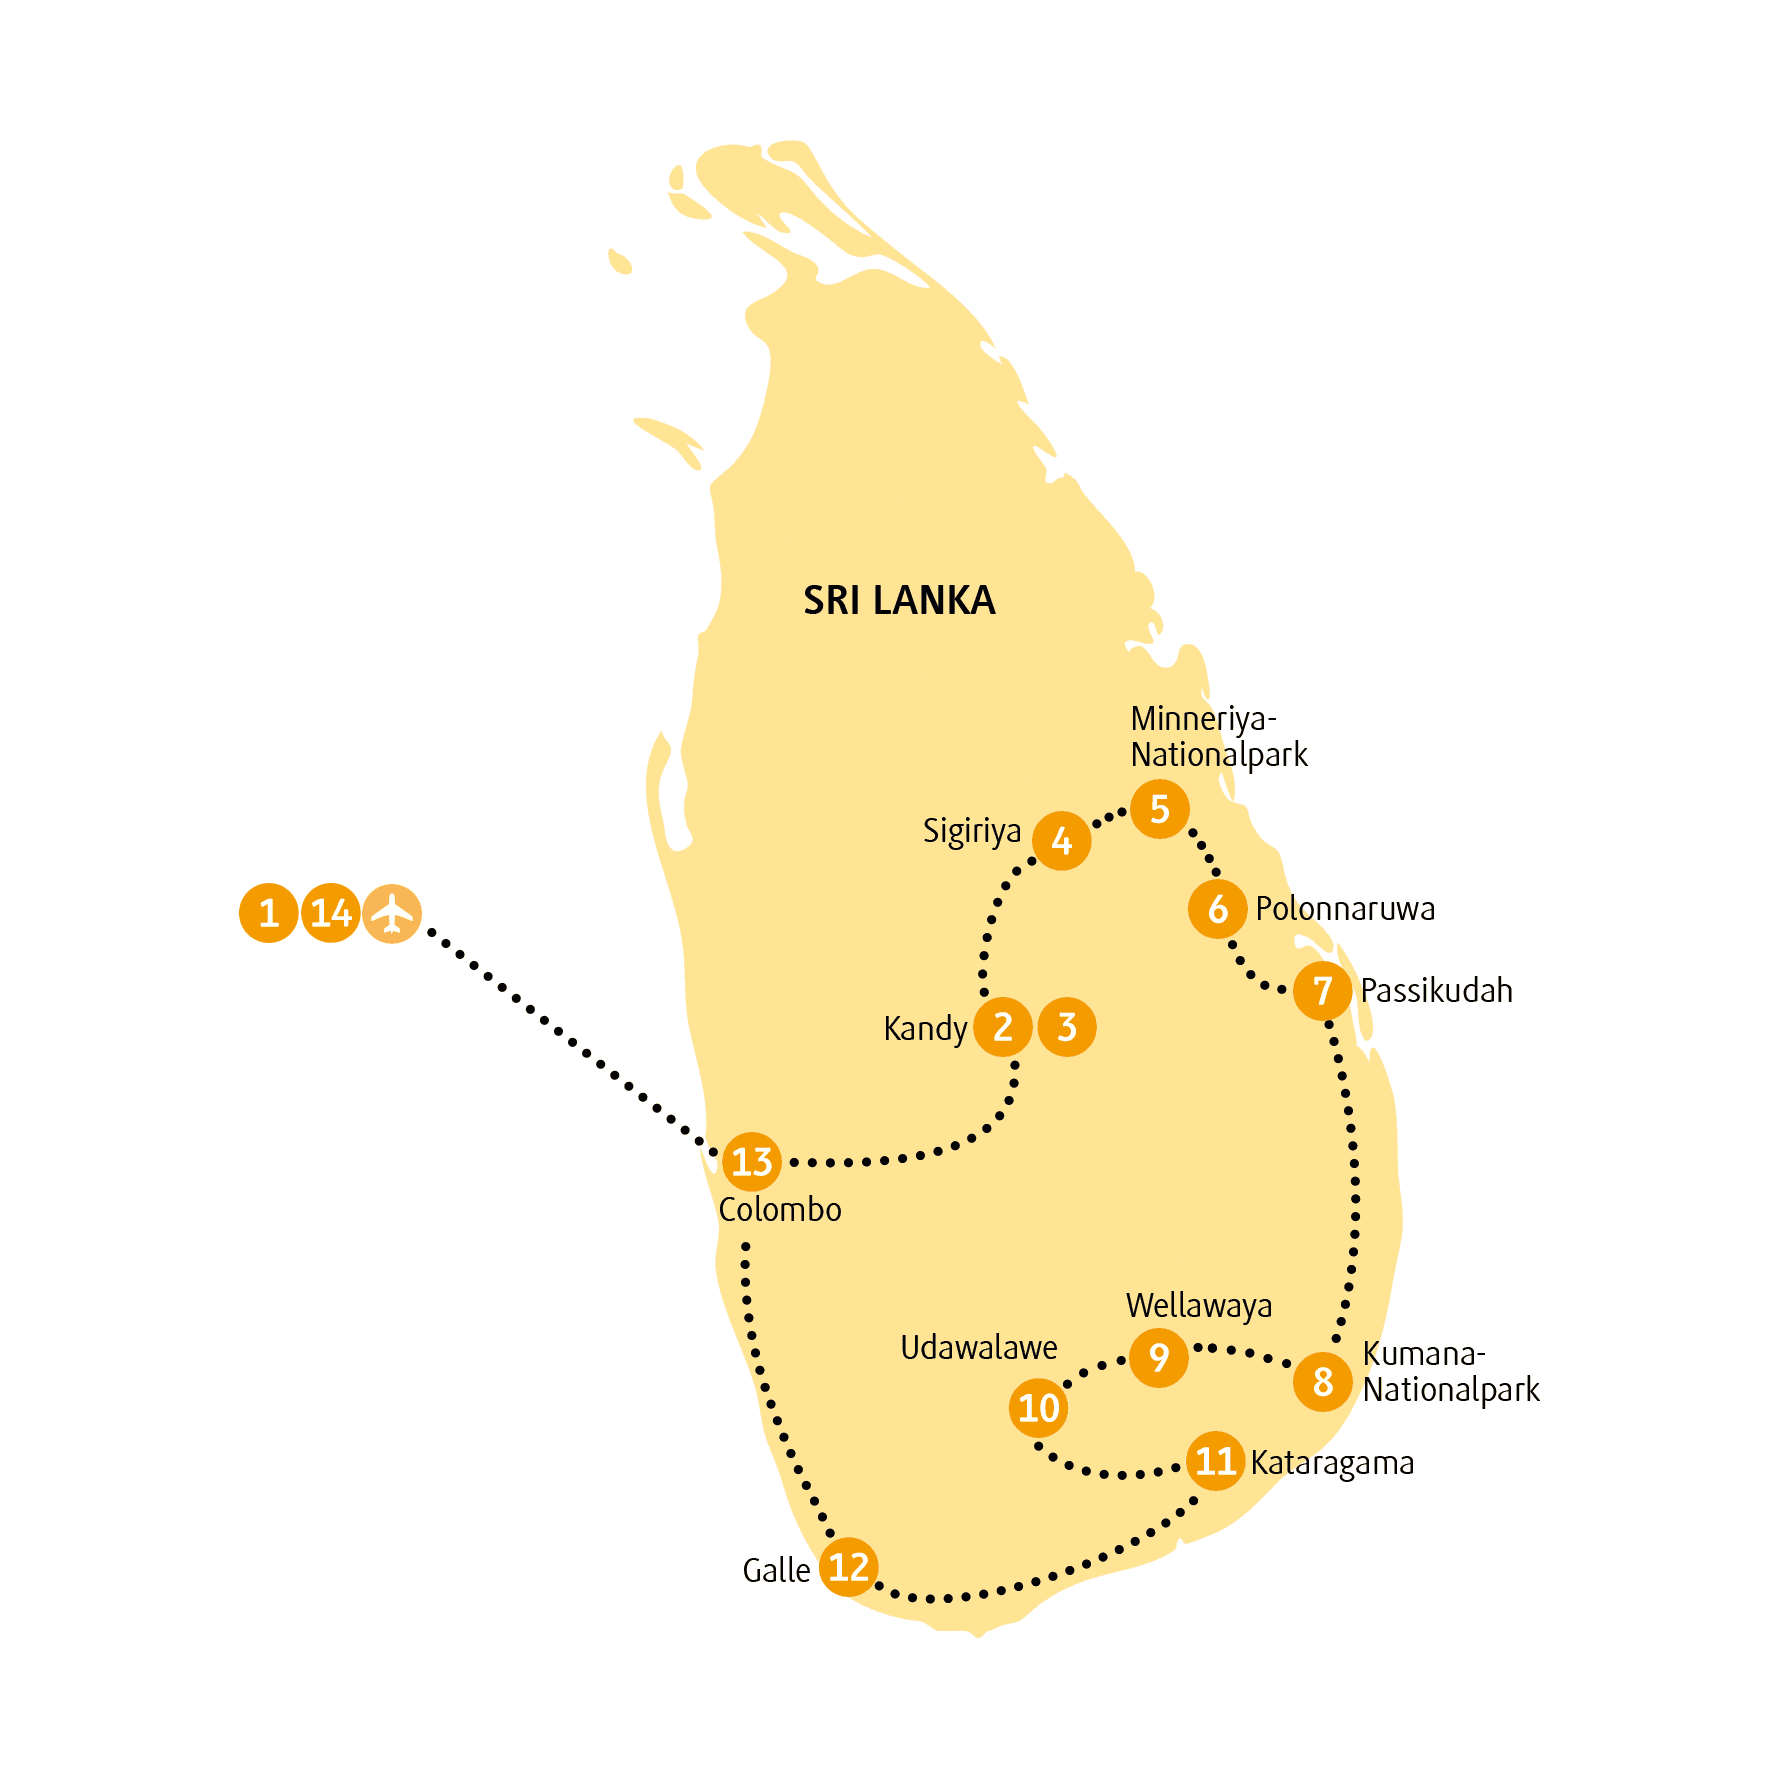 Wunderwelten Reise Sri Lanka Sigiriya 14 Tage Von Chamaleon Sri Lanka Reisen Sri Lanka Reisen